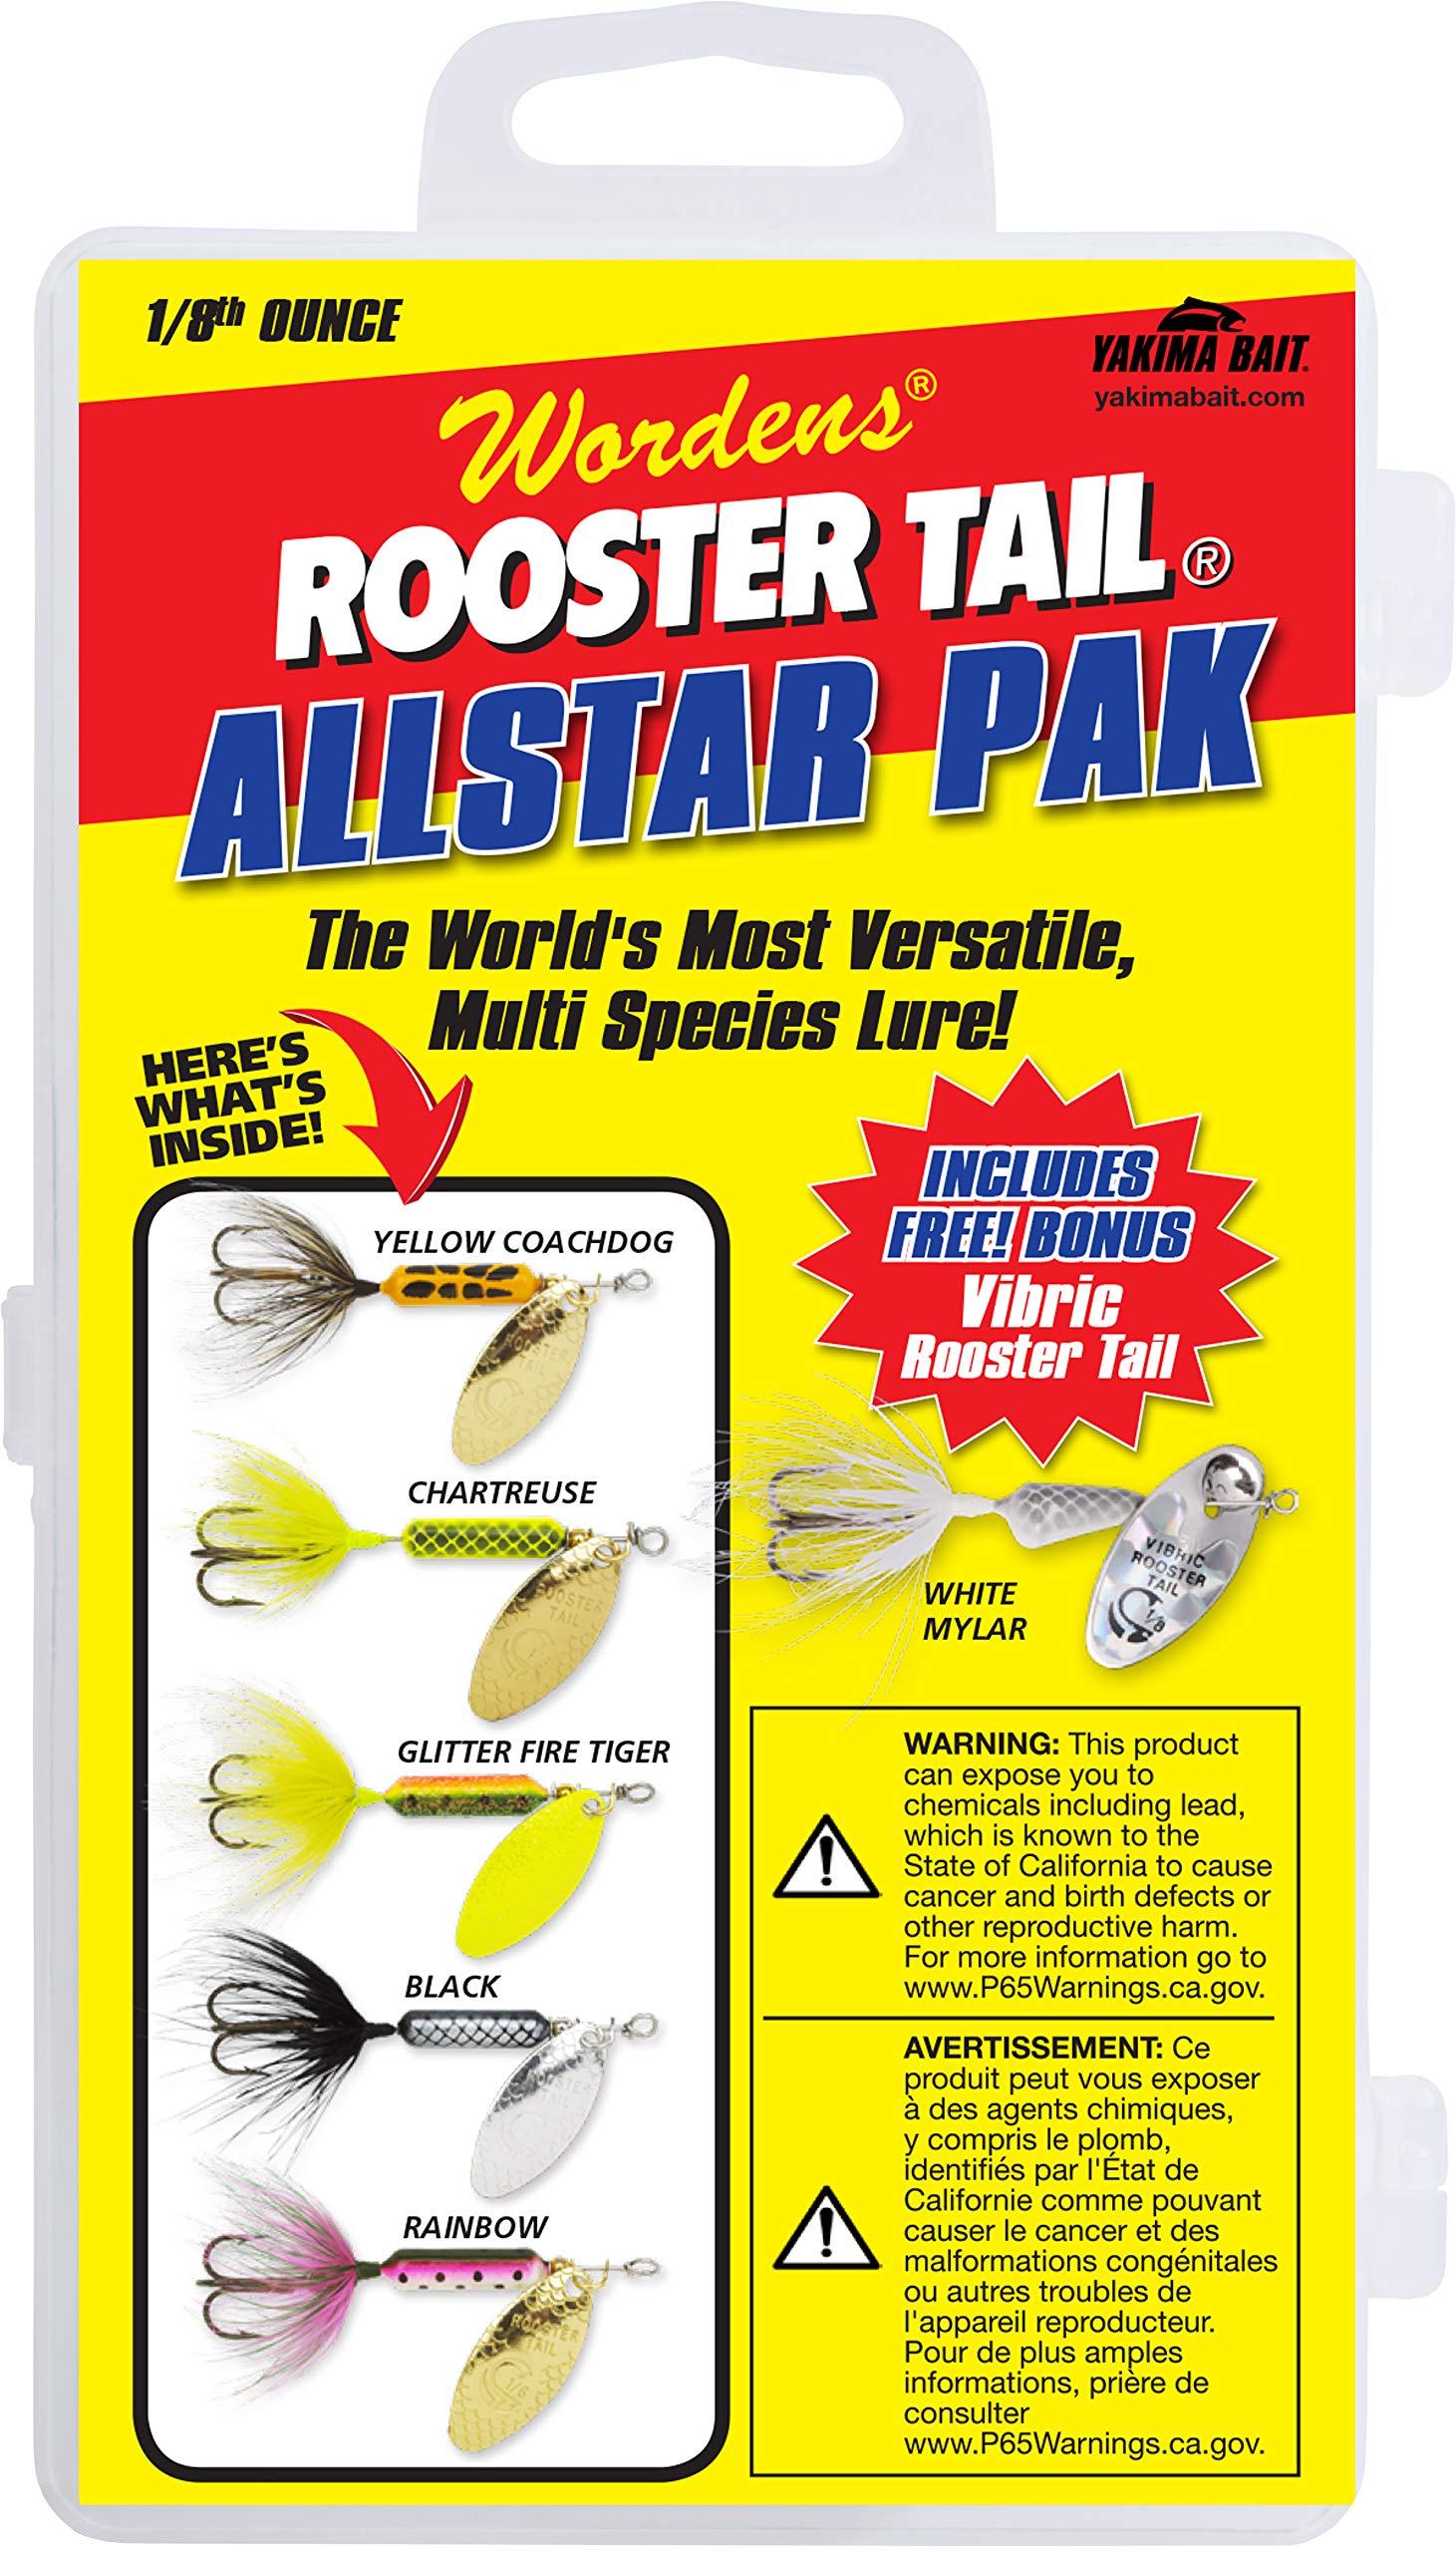 Yakima Bait Rooster Tail 1/8oz Box Kit- Allstar Pak Mix by Yakima Bait